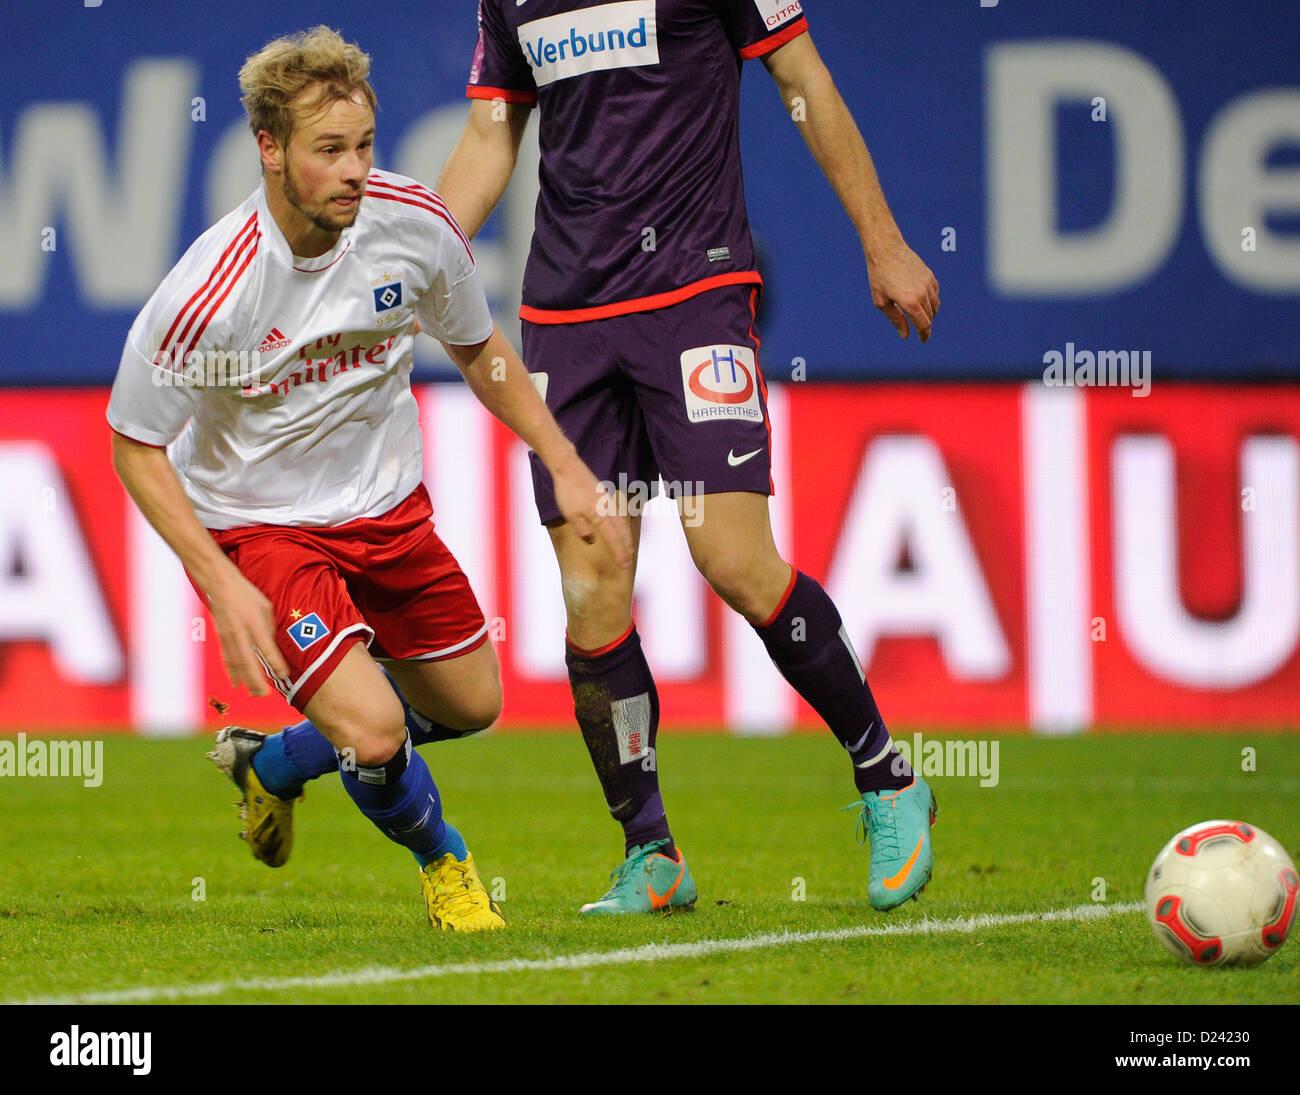 Hamburg's Maximilian Beister passes the ball during the soccer friendly Hamburger SV vs FK Austria Wien at Imtech - Stock Image